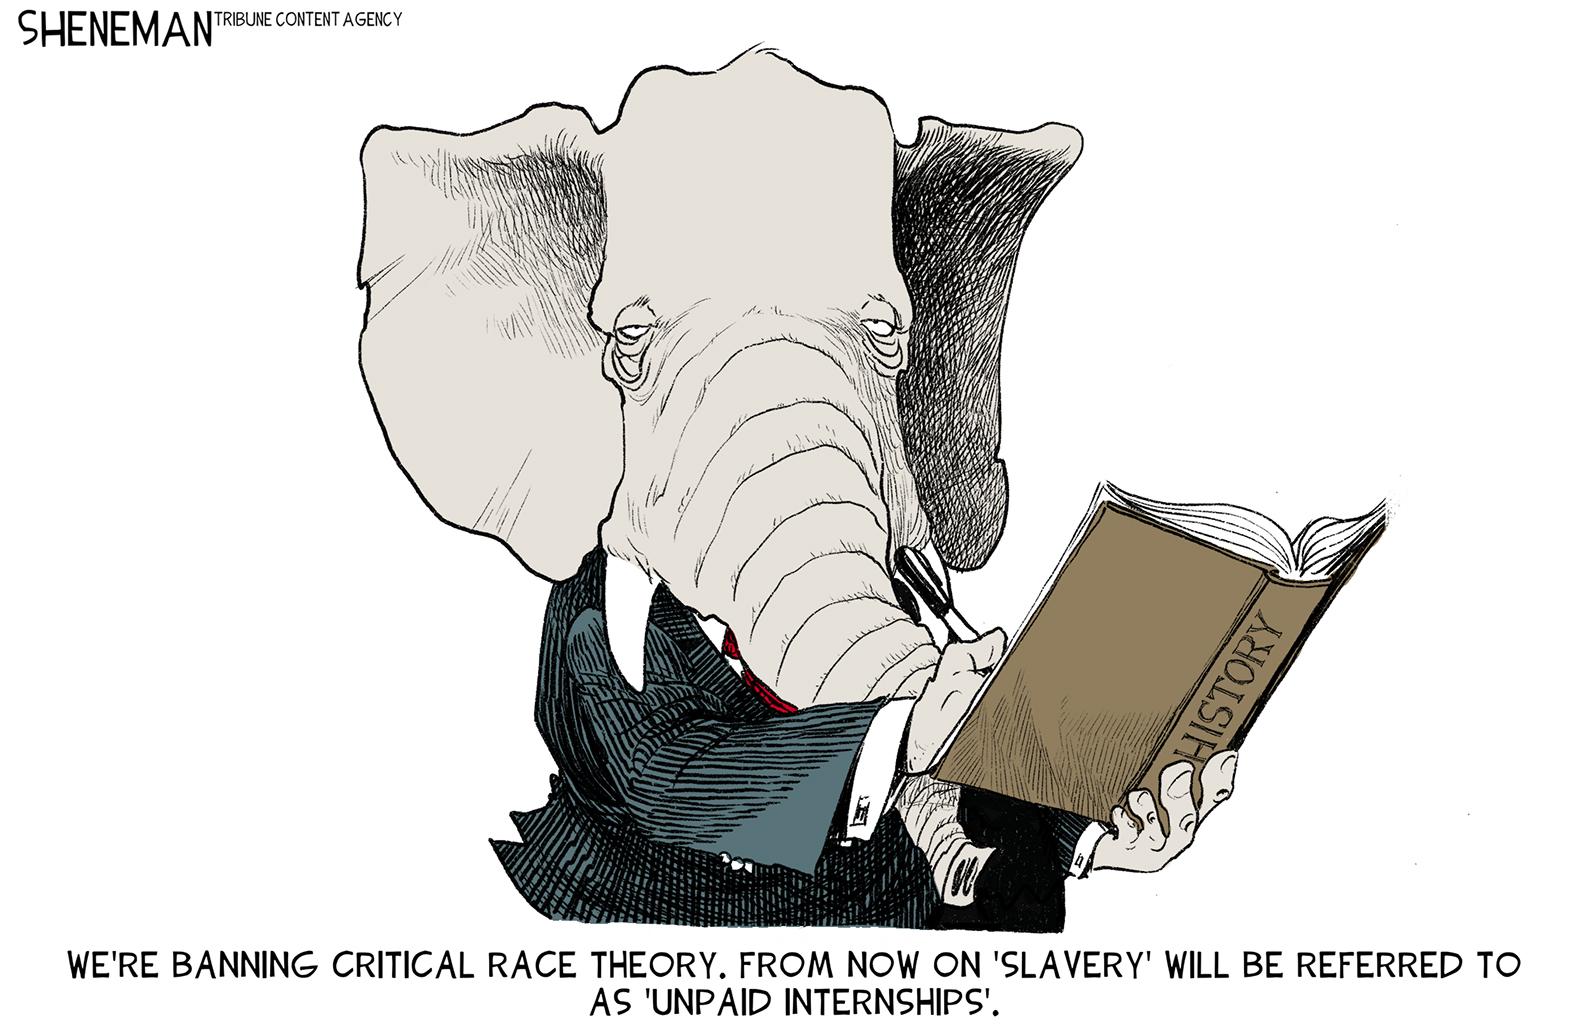 June 19: Critical Race Theory